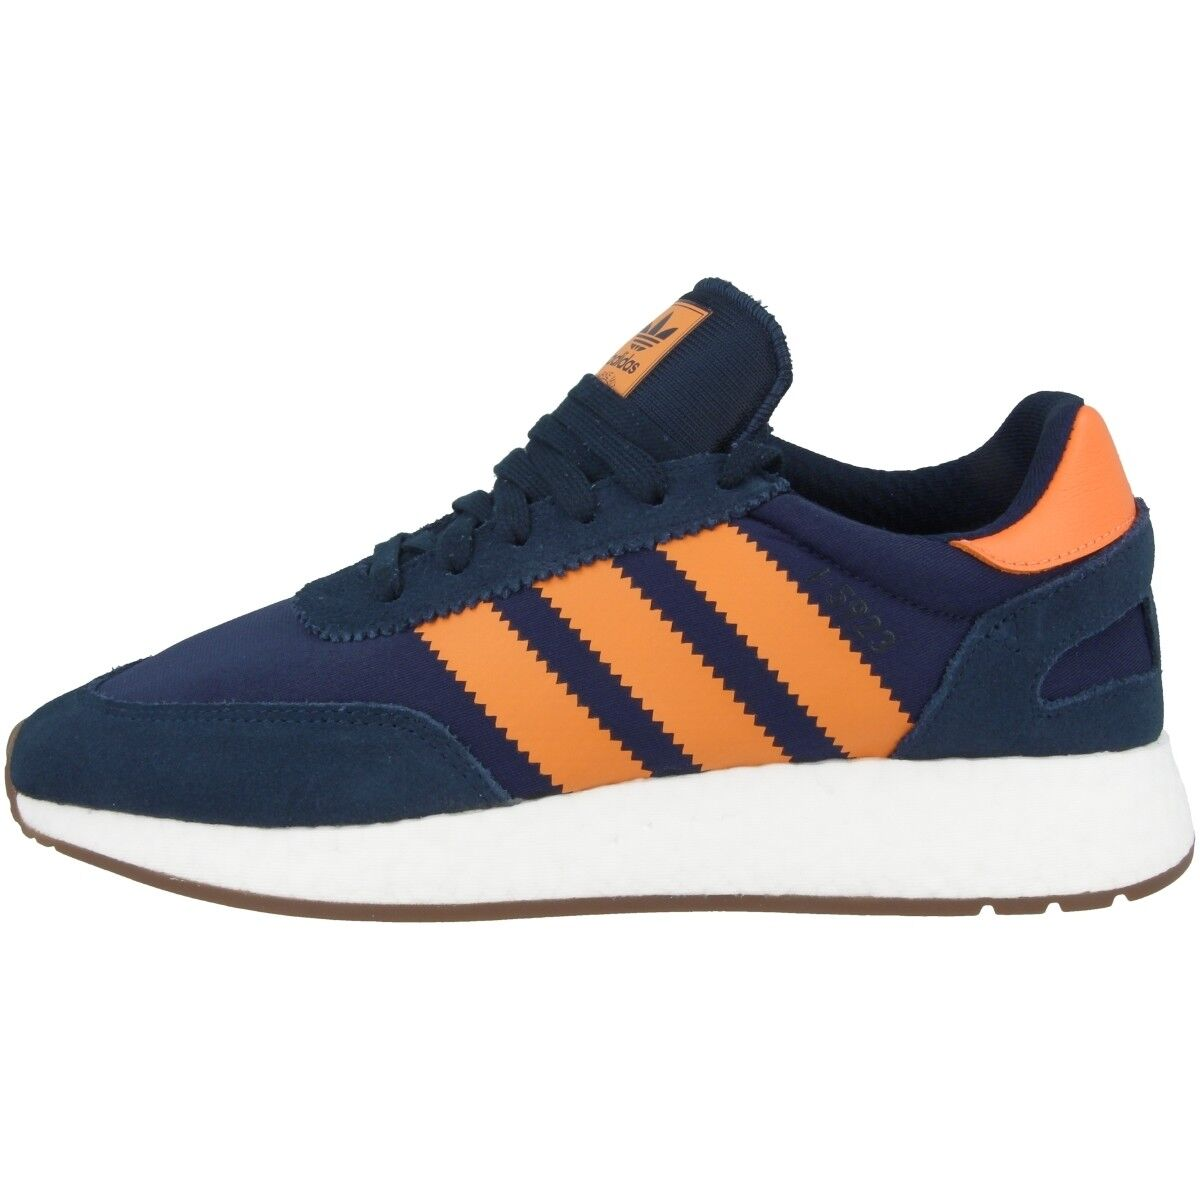 Adidas I-5923 Schuhe Originals Freizeit Turnschuhe Turnschuhe Turnschuhe Turnschuhe navy gum grau B37919 740e9e